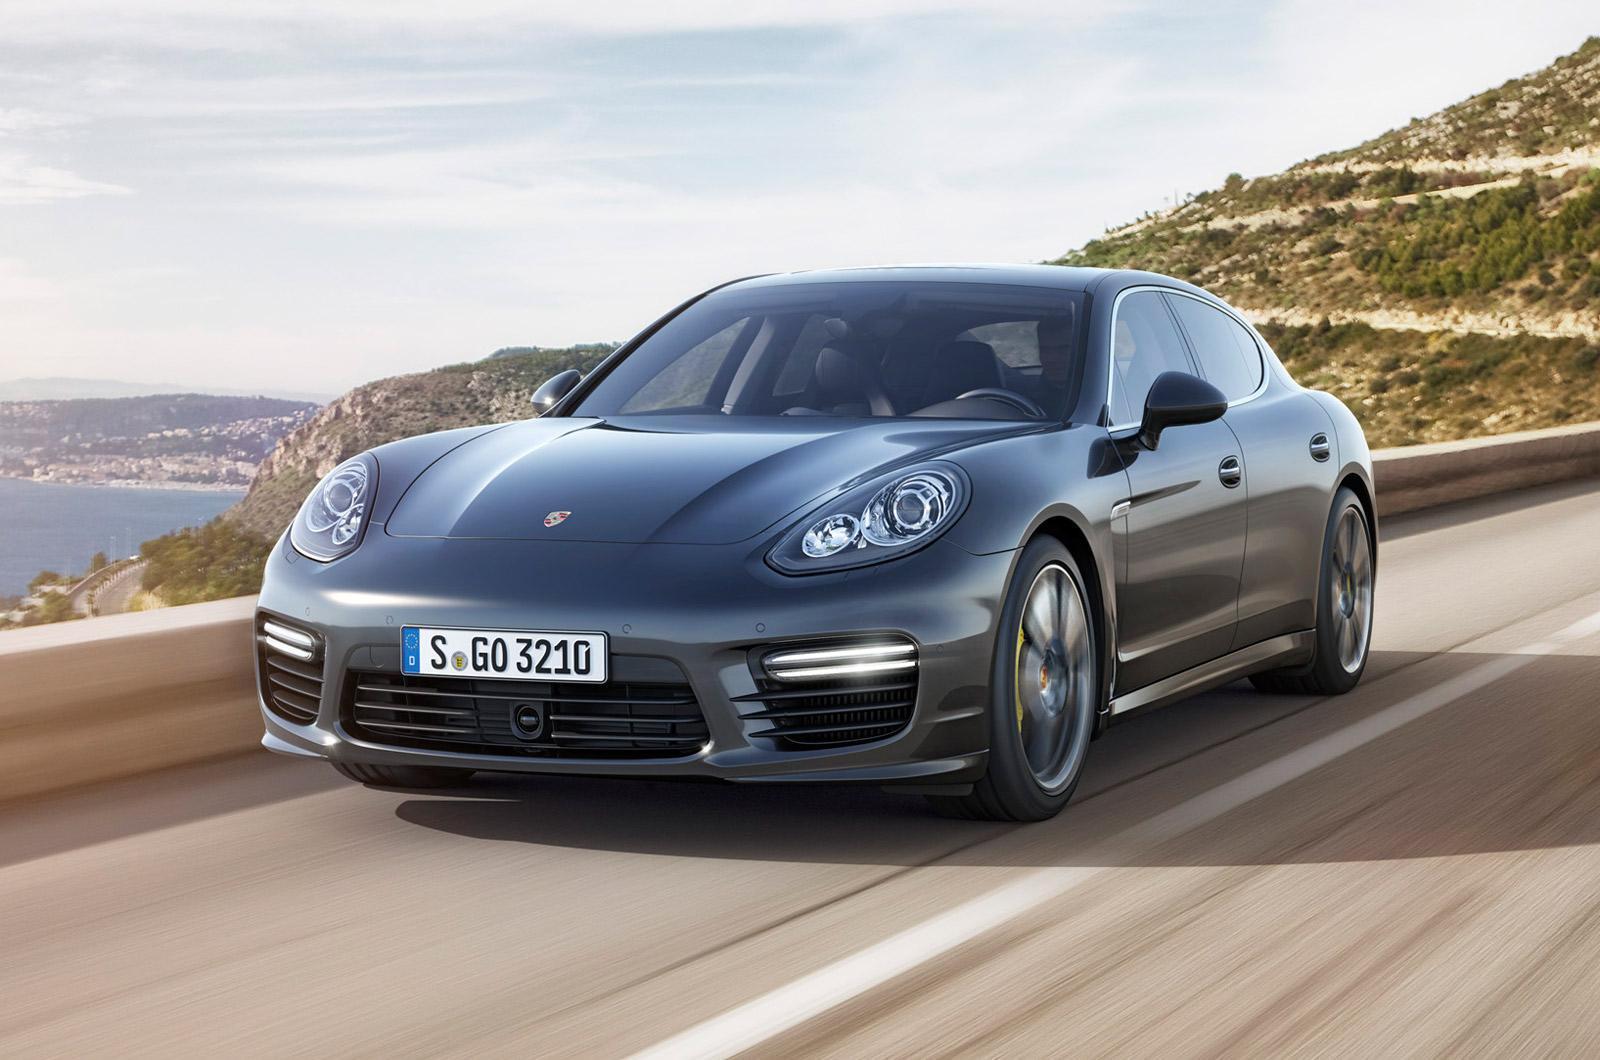 Porsche Launches 2014 Porsche Panamera Turbo S Facelift ...